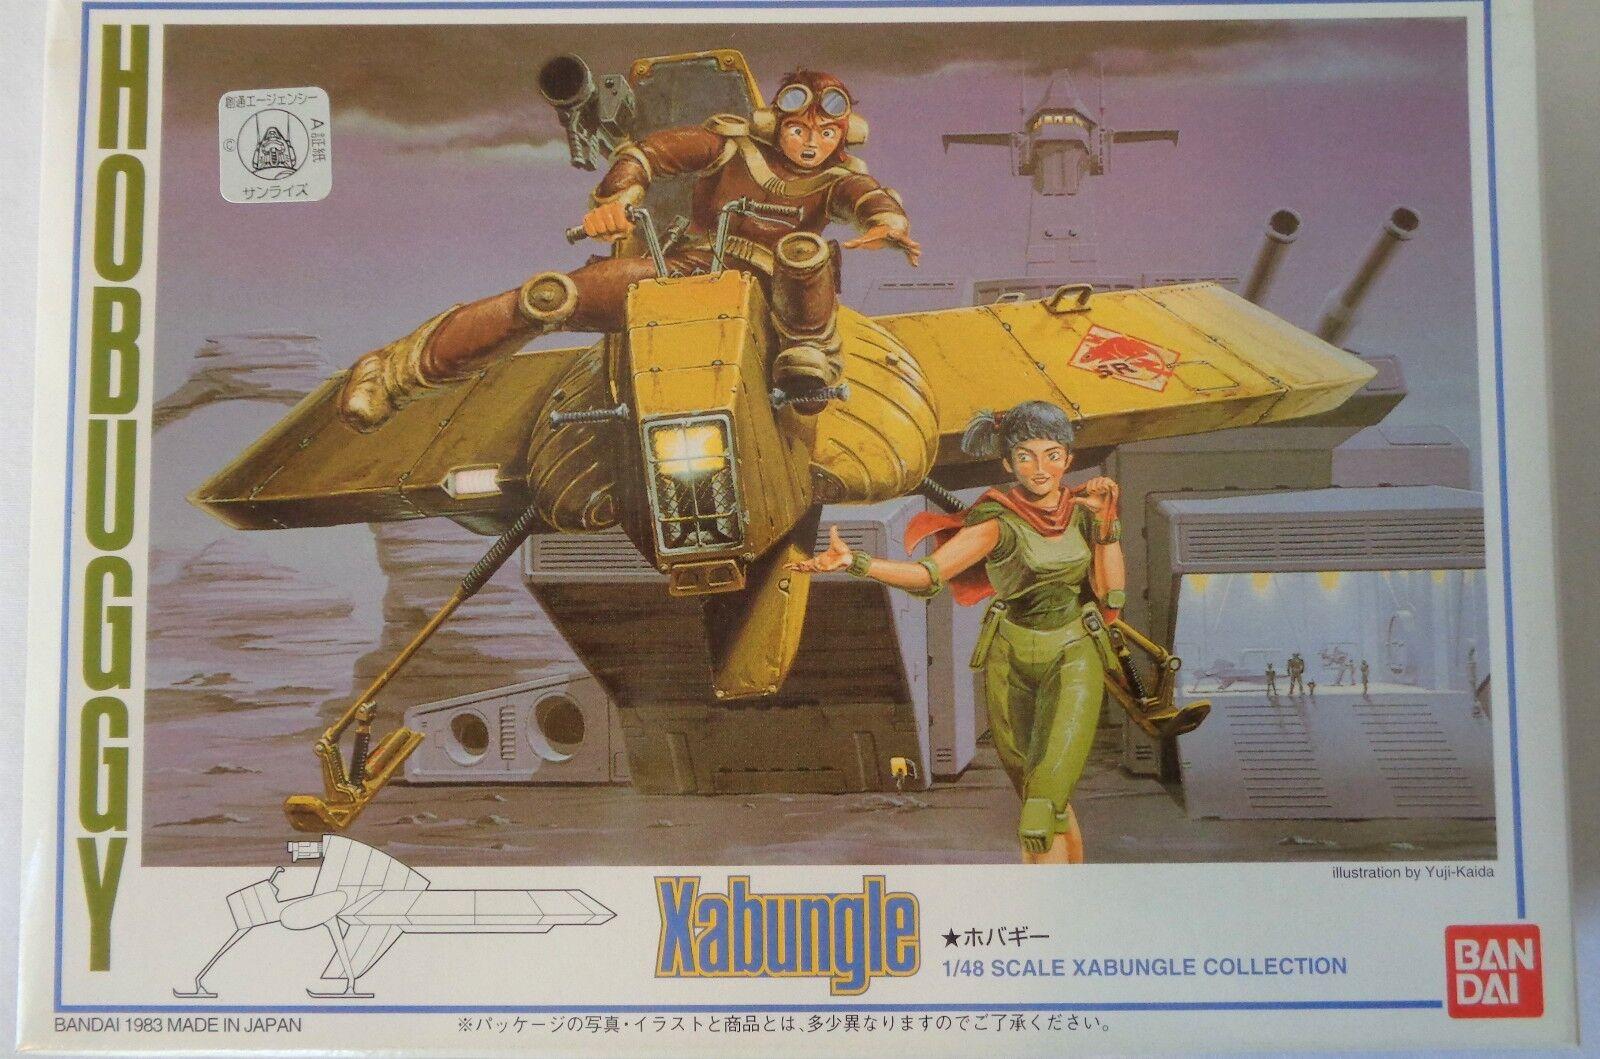 Xabungle Series - Hobuggy - 1/48th Scale - BANDAI - RARE Mod